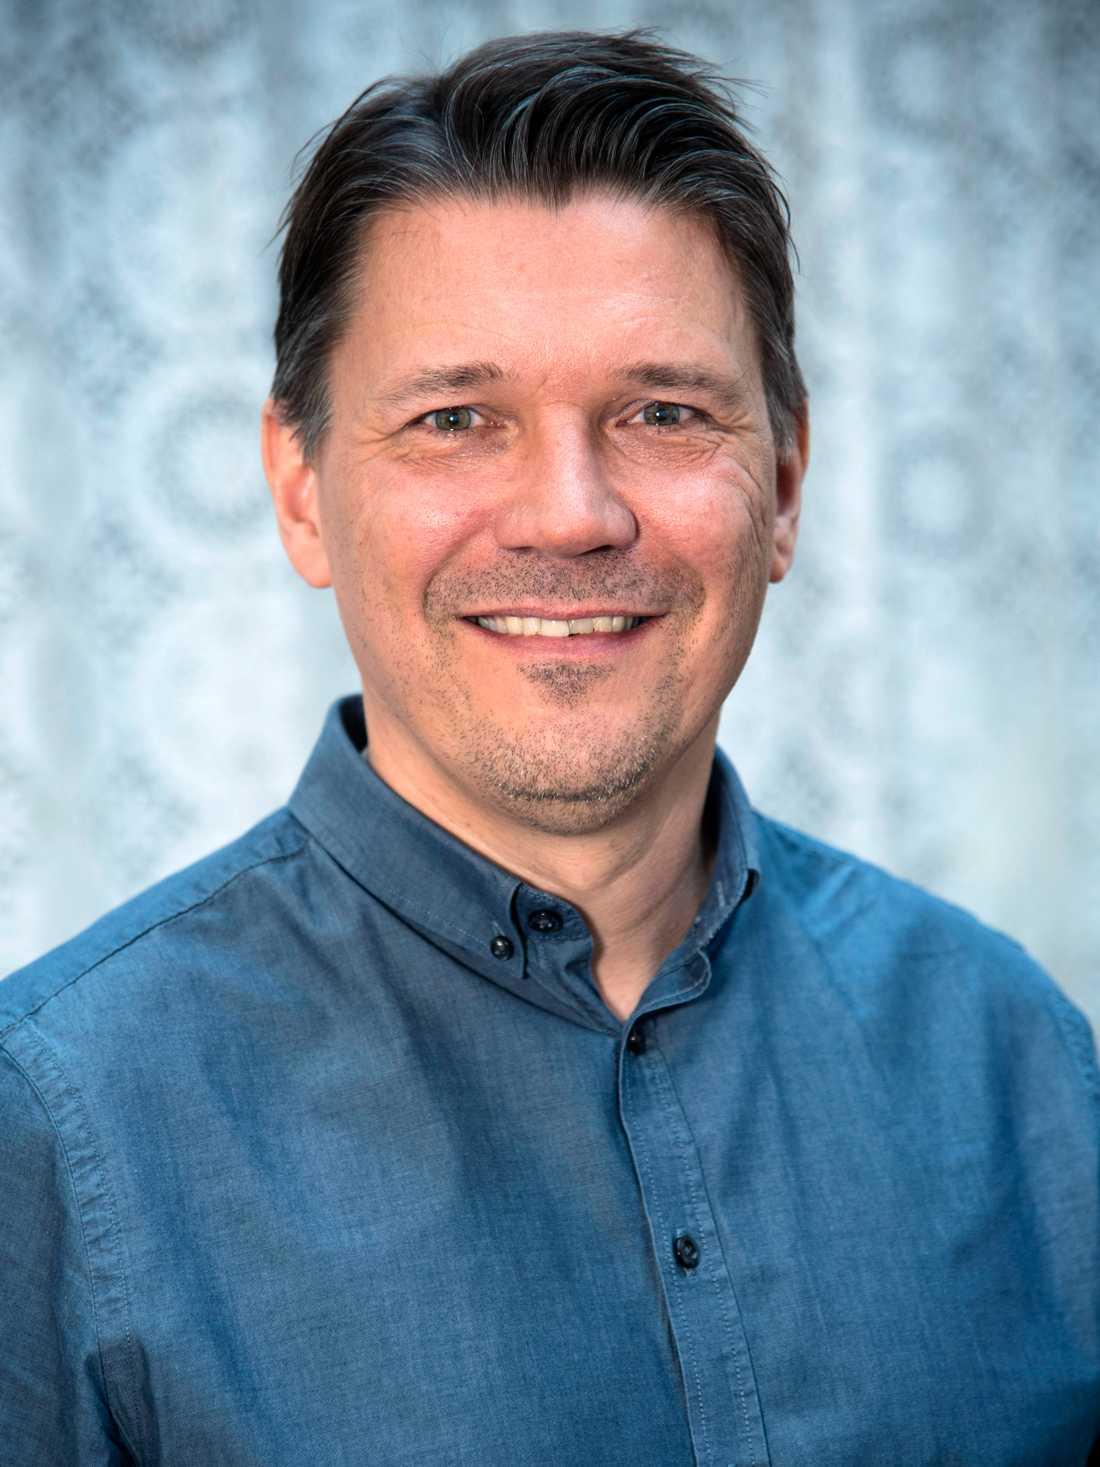 Aftonbladets redaktionschef Michael Poromaa.